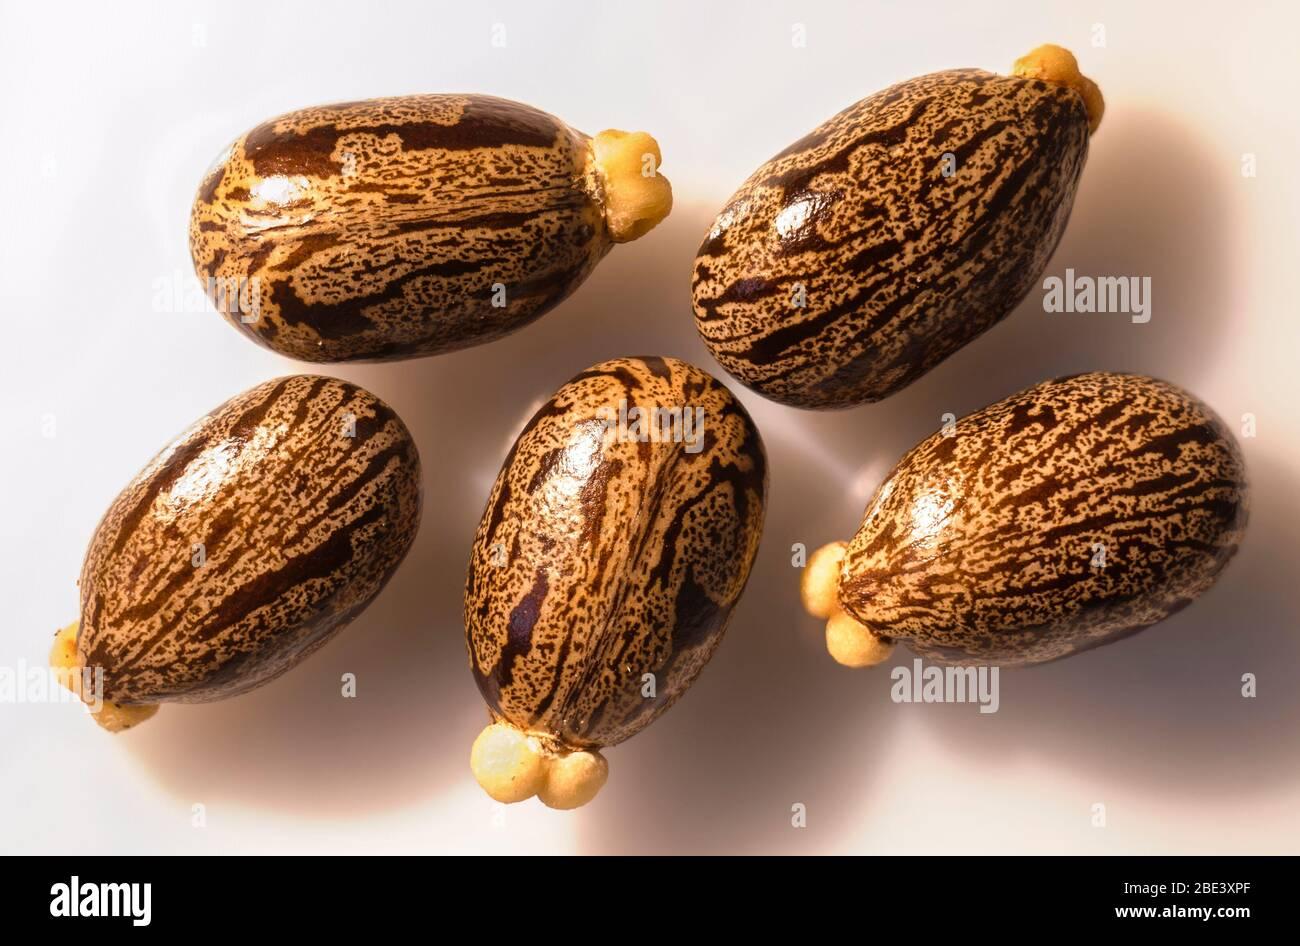 Ricinus Communis Seeds Stock Photo Alamy